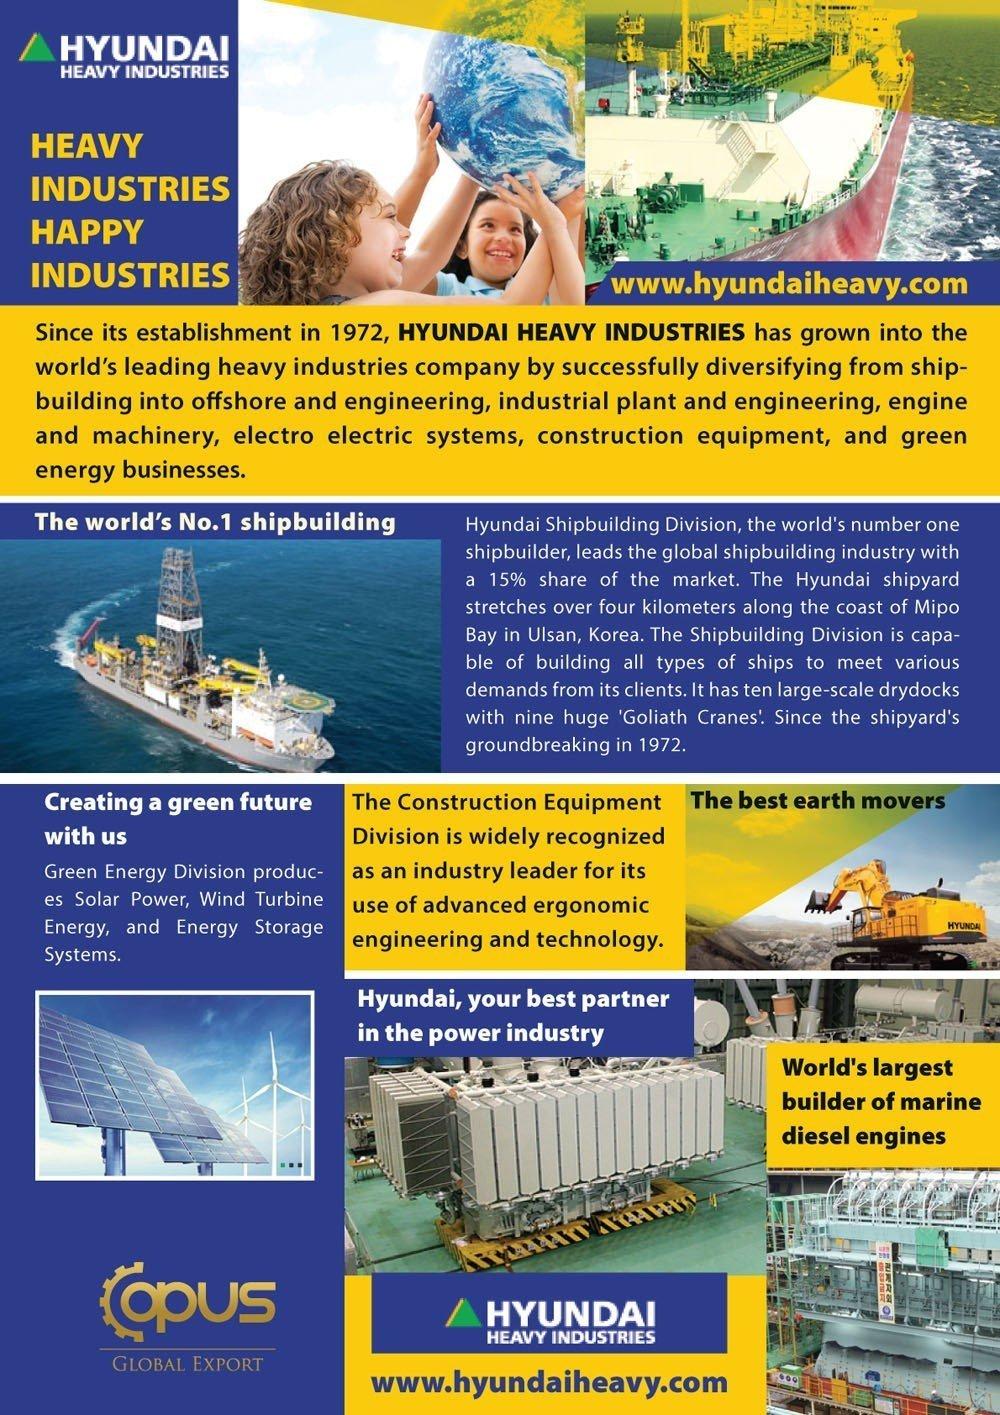 SHIPBUILDING-MARINE-PORT-AND-OFFSHORE-TECHNOLOGY-HYUNDAI-HEAVY-INDUSTRIES-CO-LTD